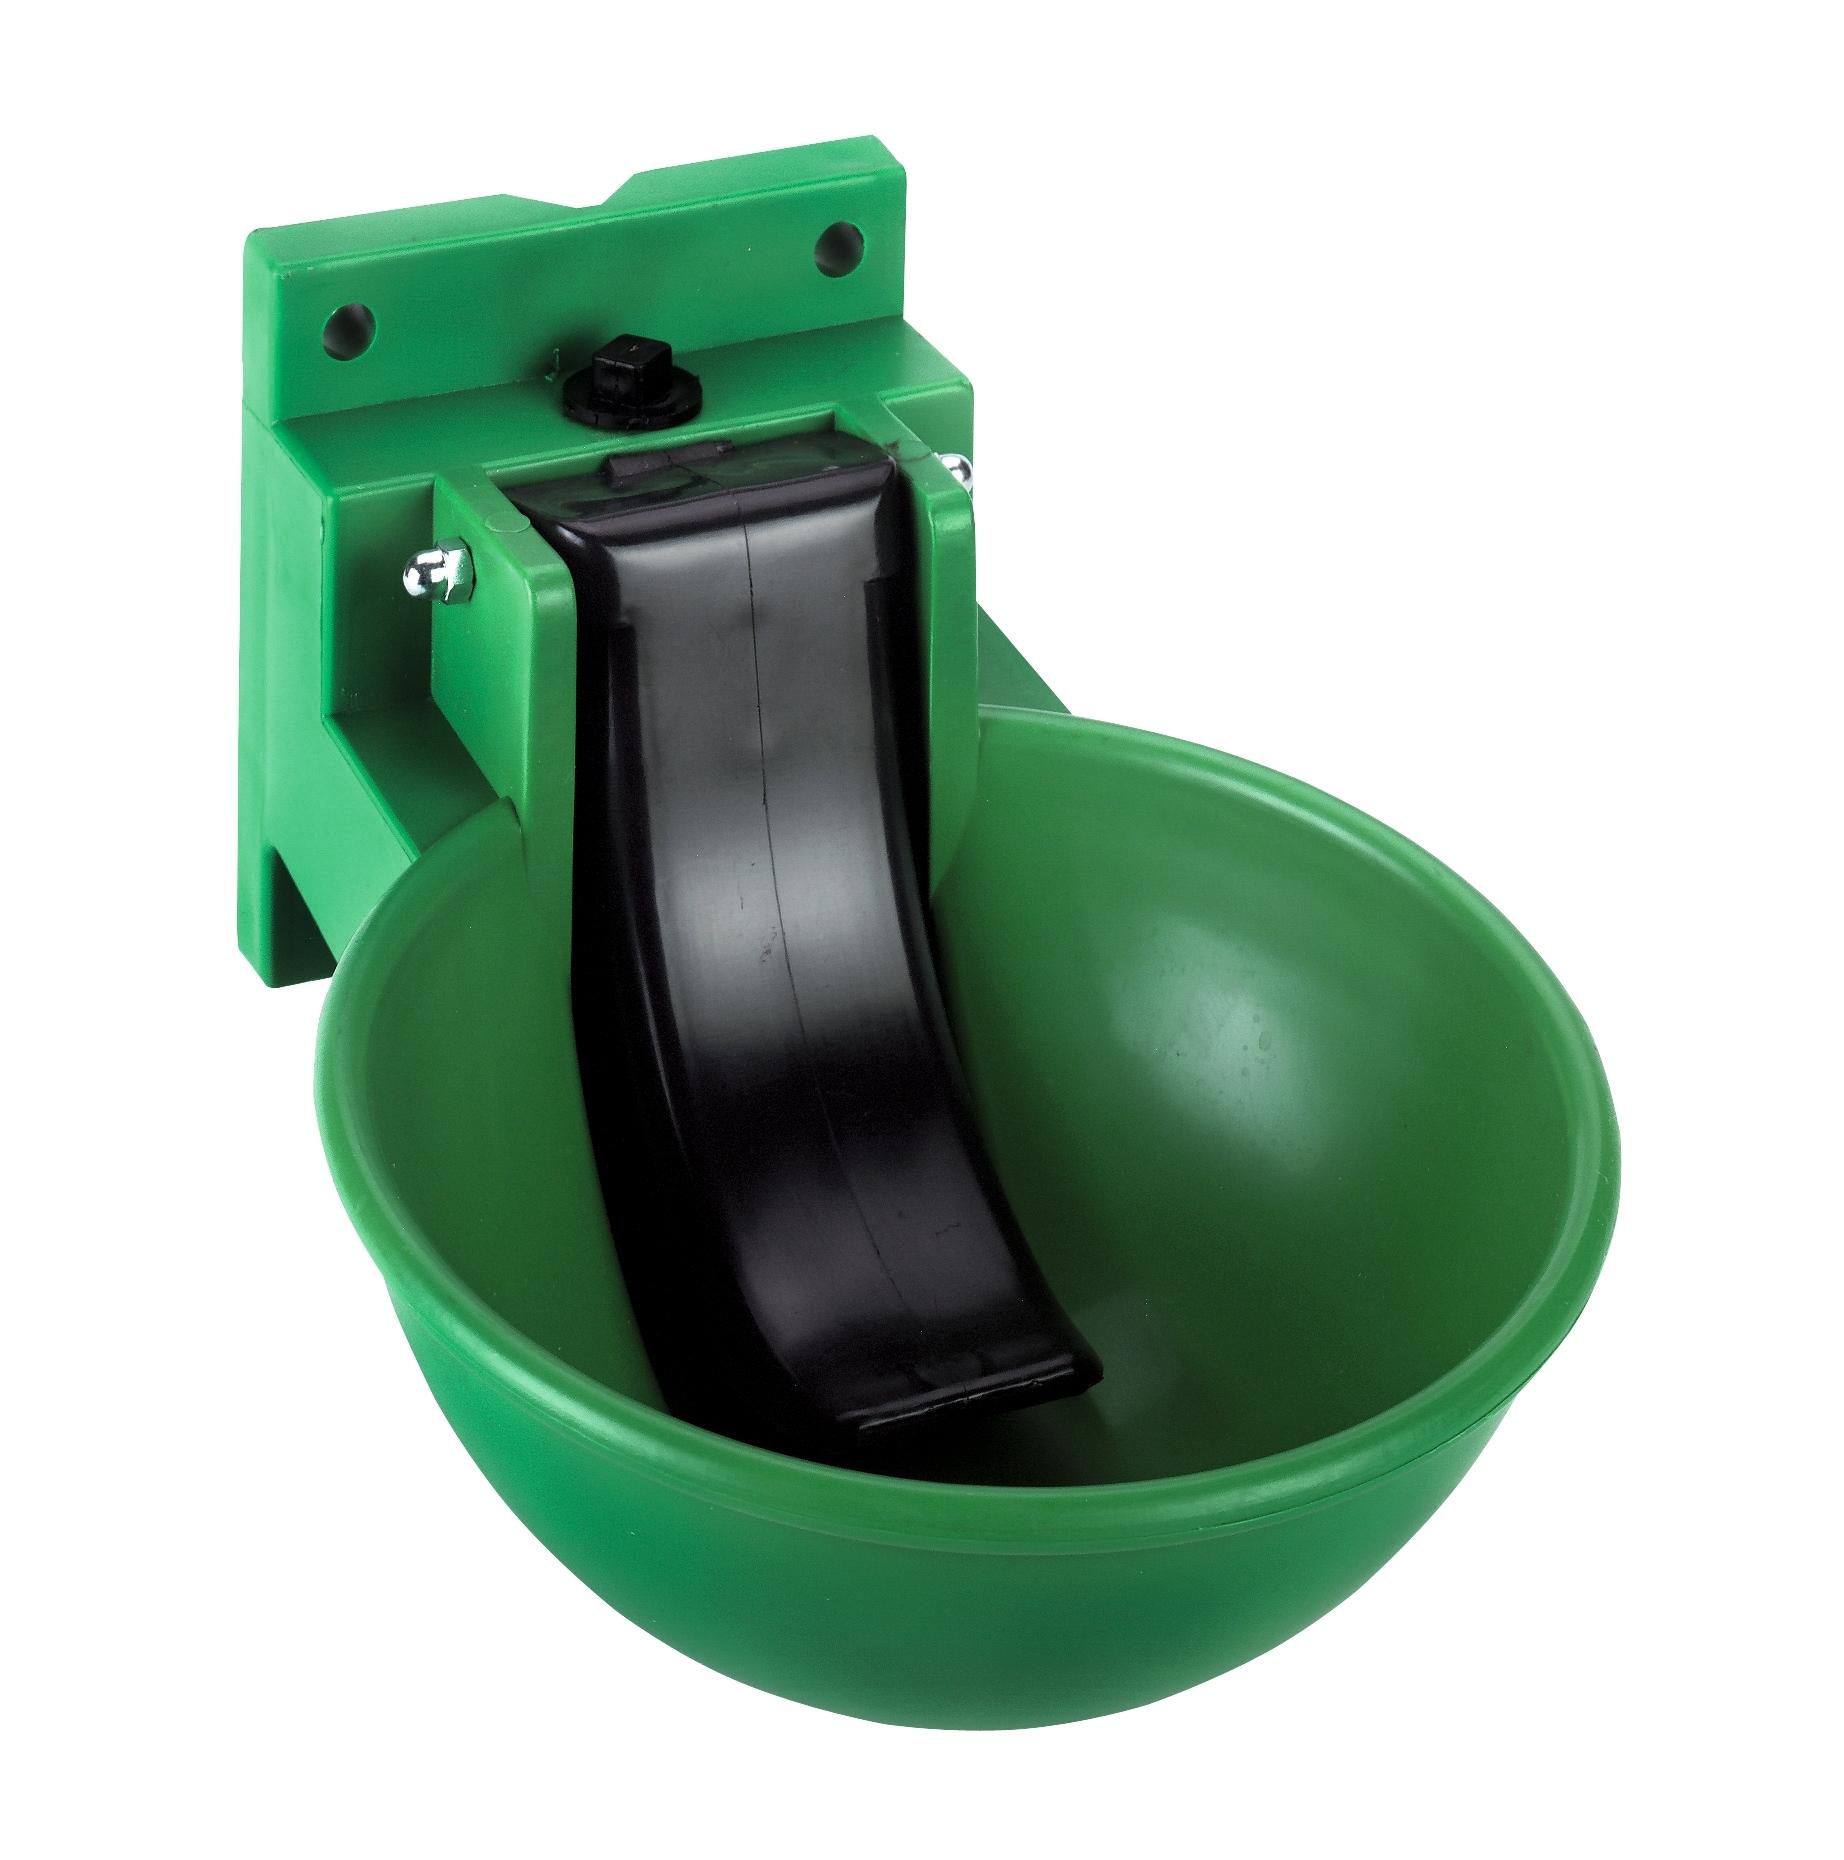 Drinkbak KS met lepel groen